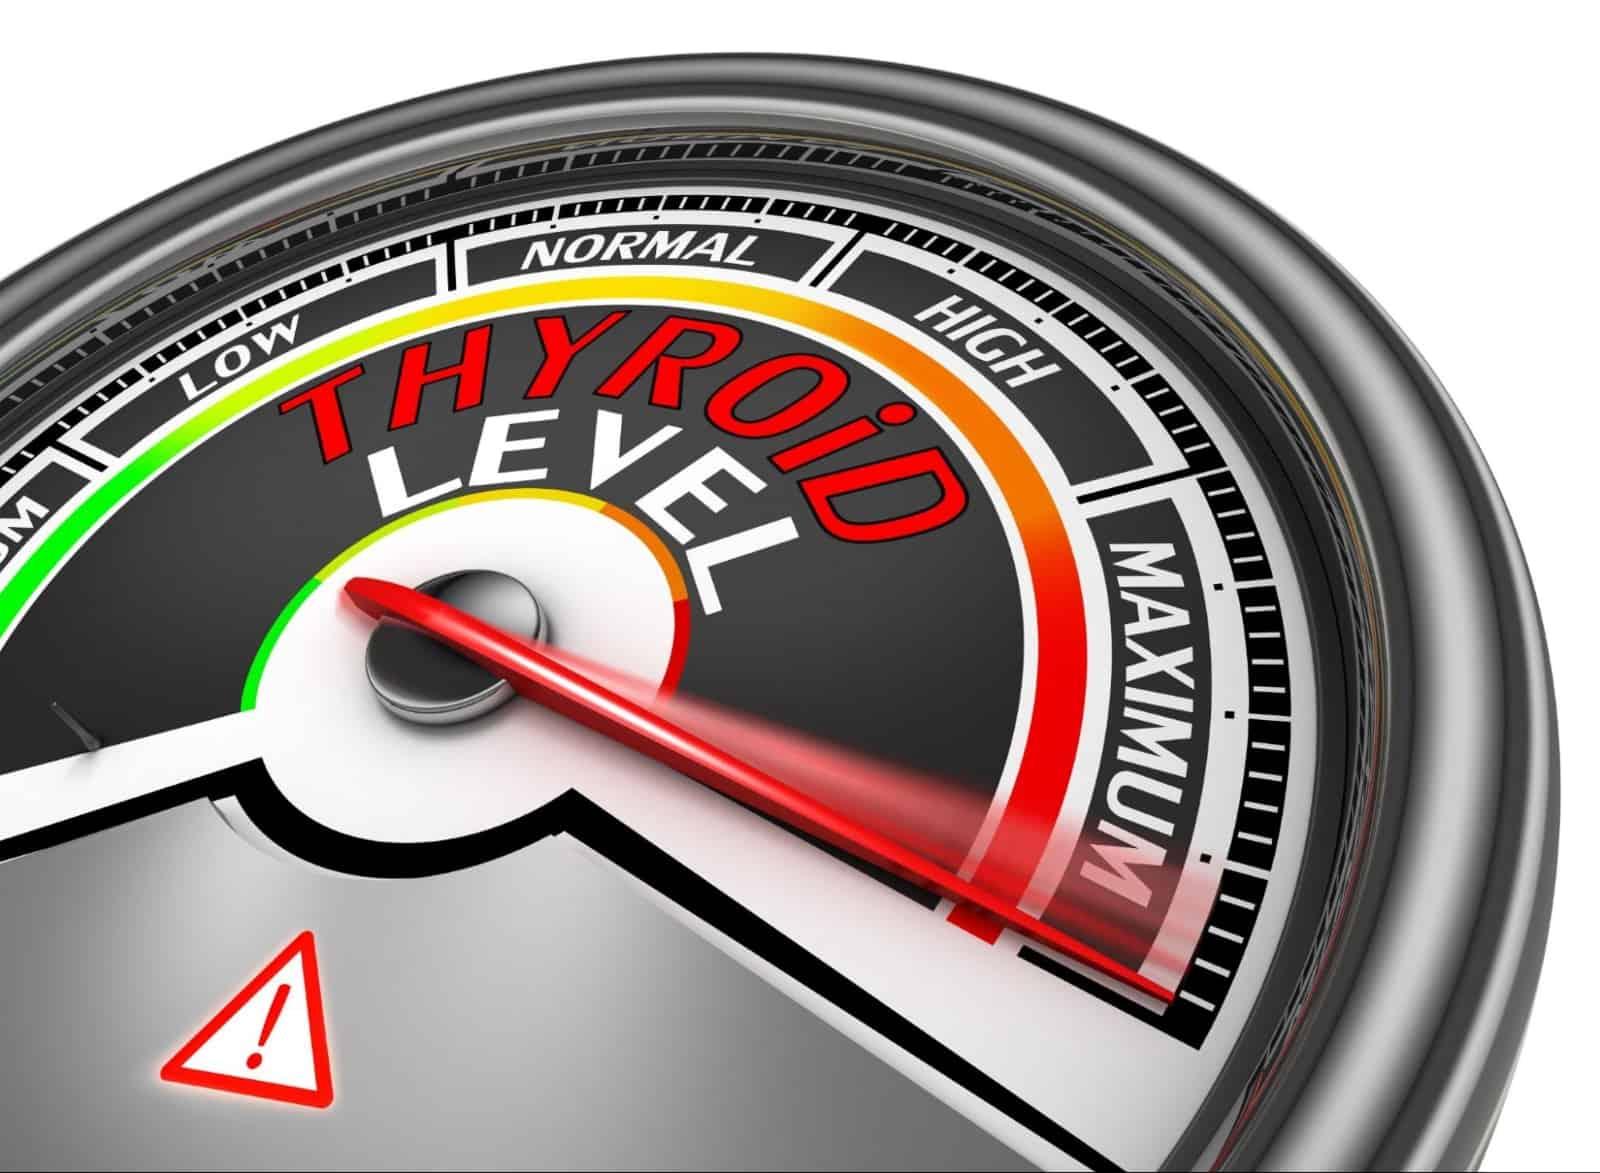 optimal thyroid levels: Thyroid level meter at the maximum level